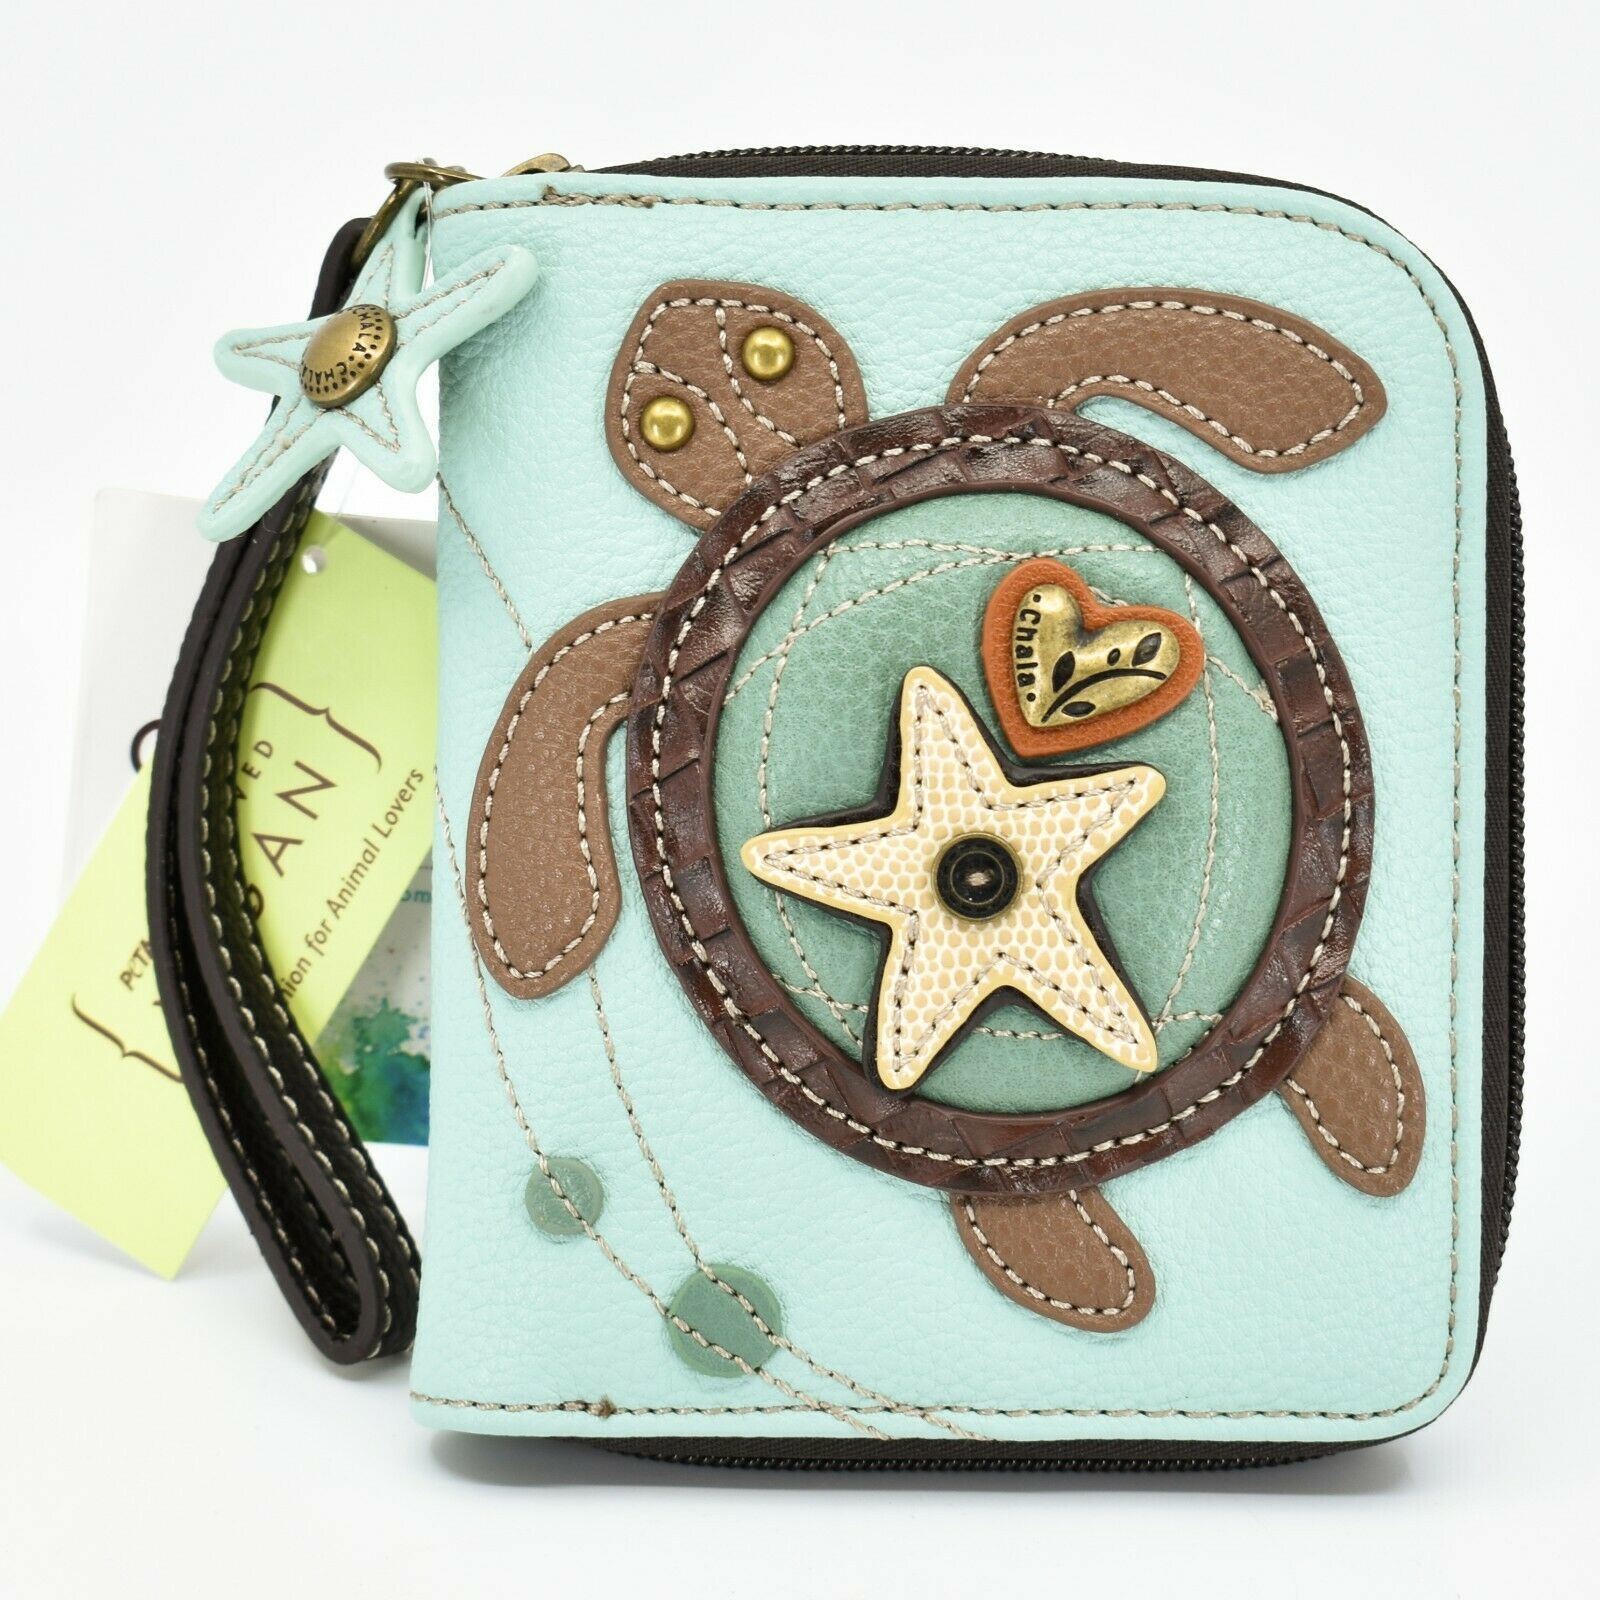 Chala Handbags Faux Leather Whimsical Sea Turtle Teal Zip Around Wristlet Wallet